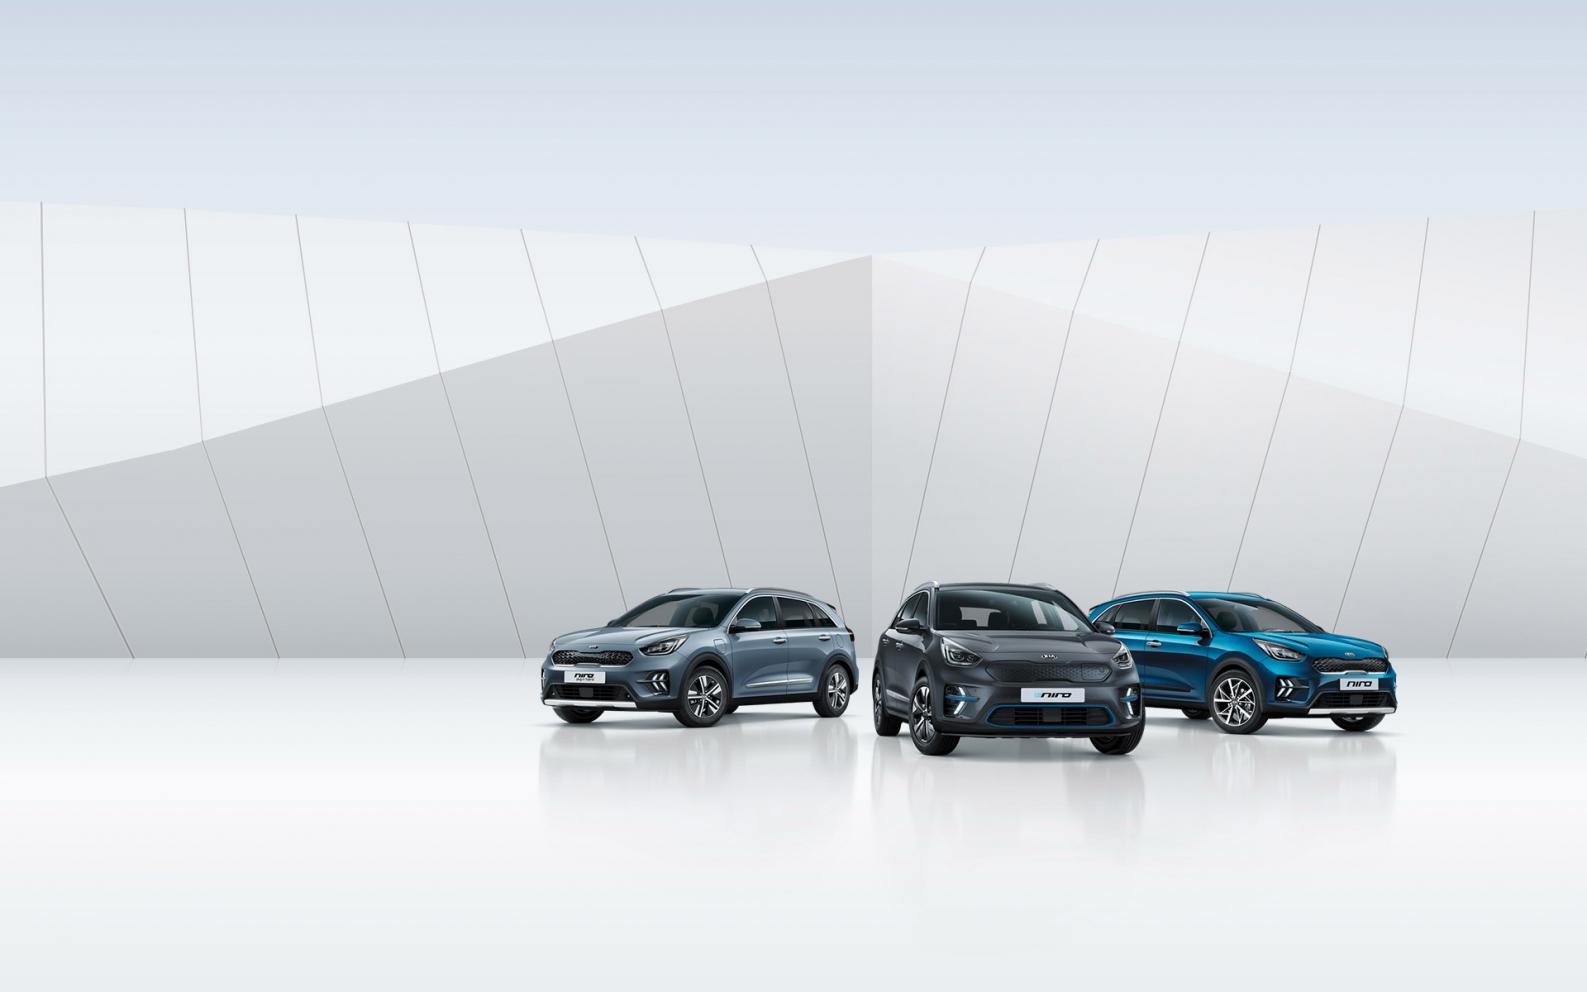 slider-homep-gamme-niro-onlycars-w.jpg